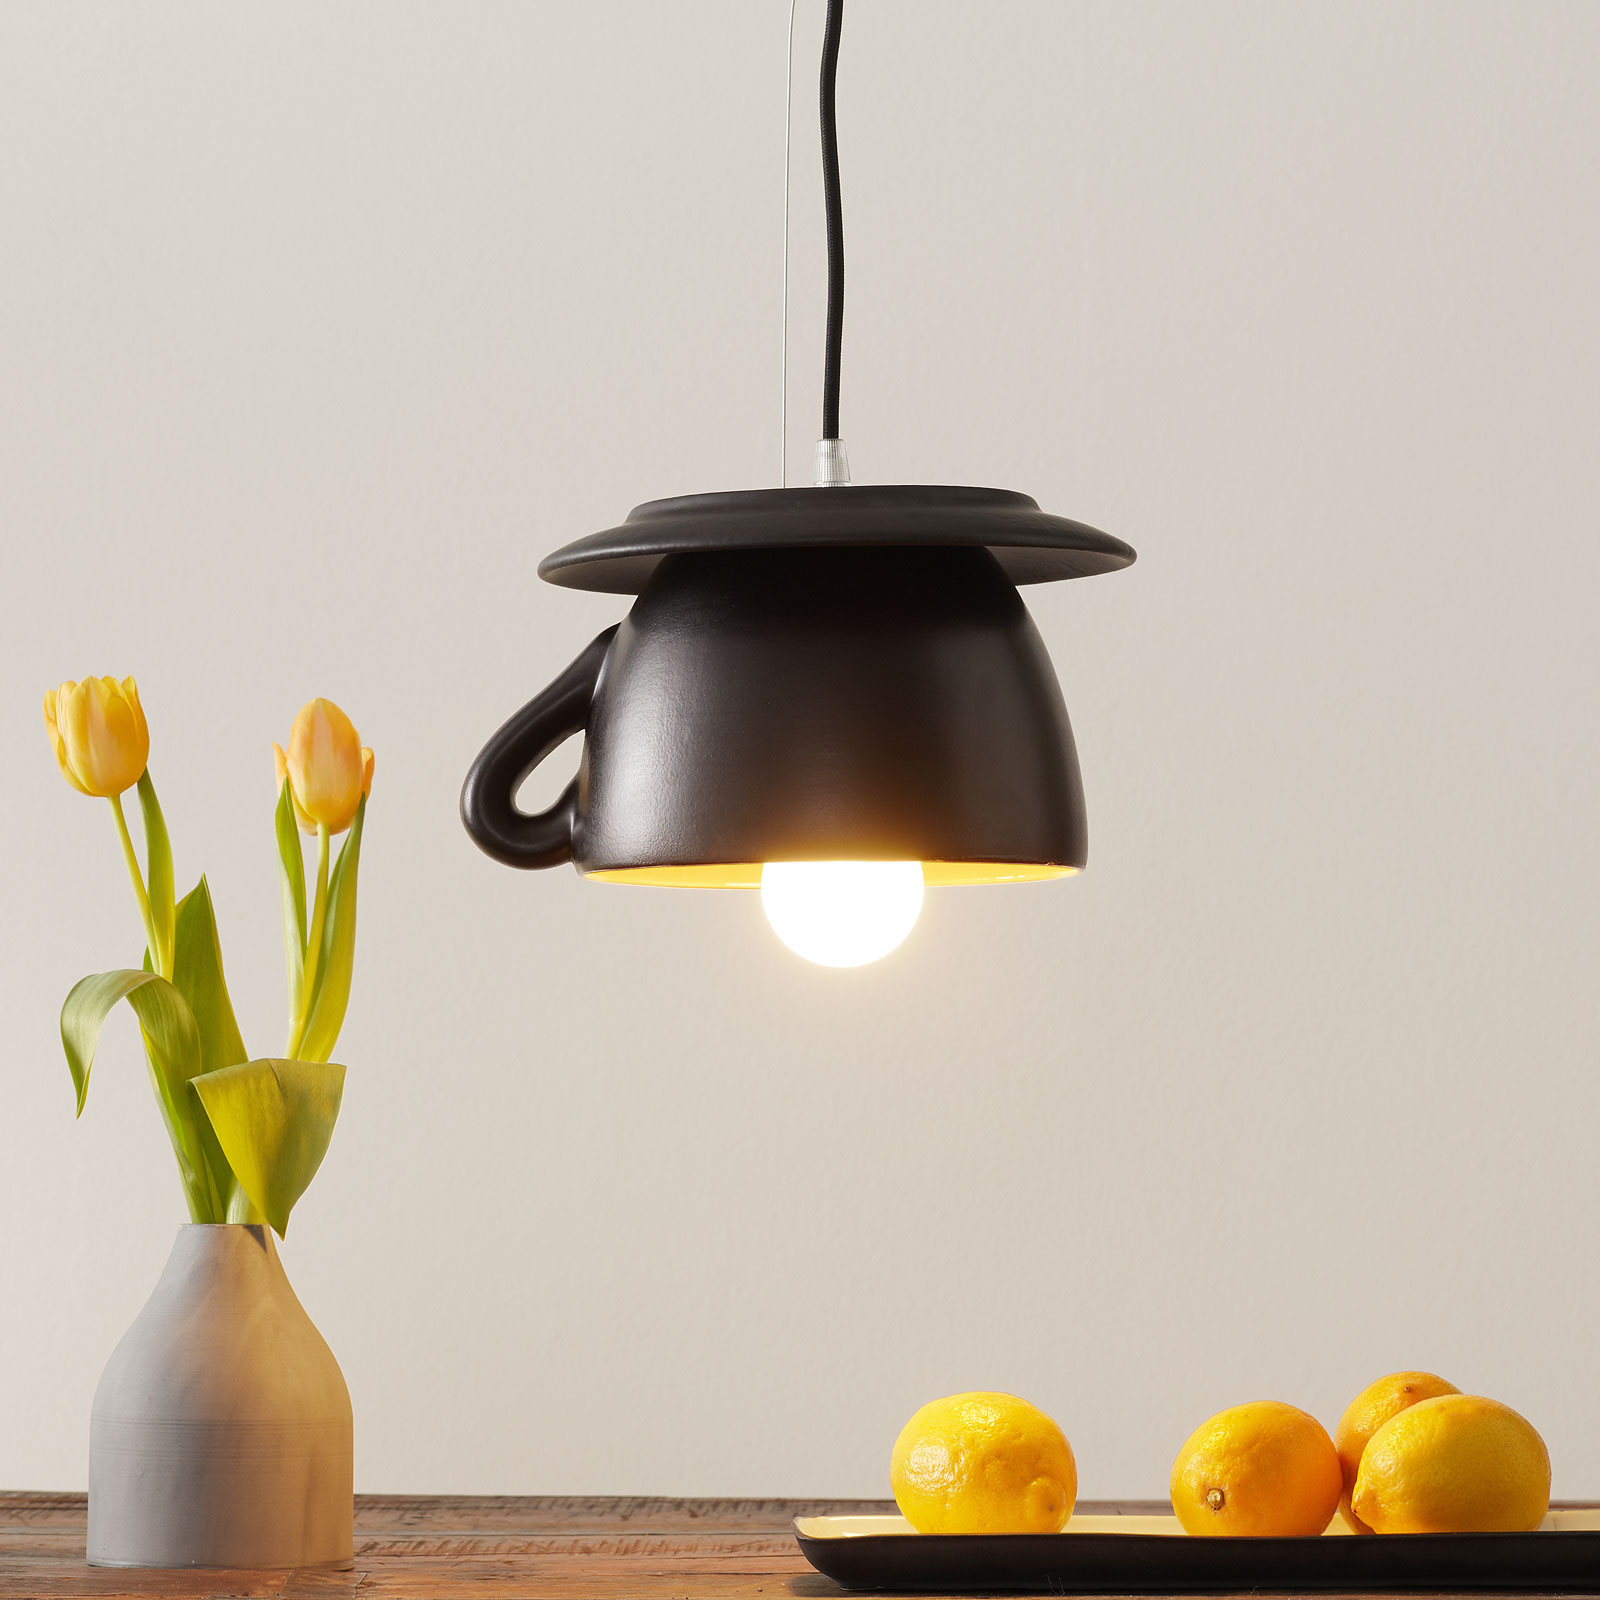 Keramiek-hanglamp S181 GLS, zwart mat/geel